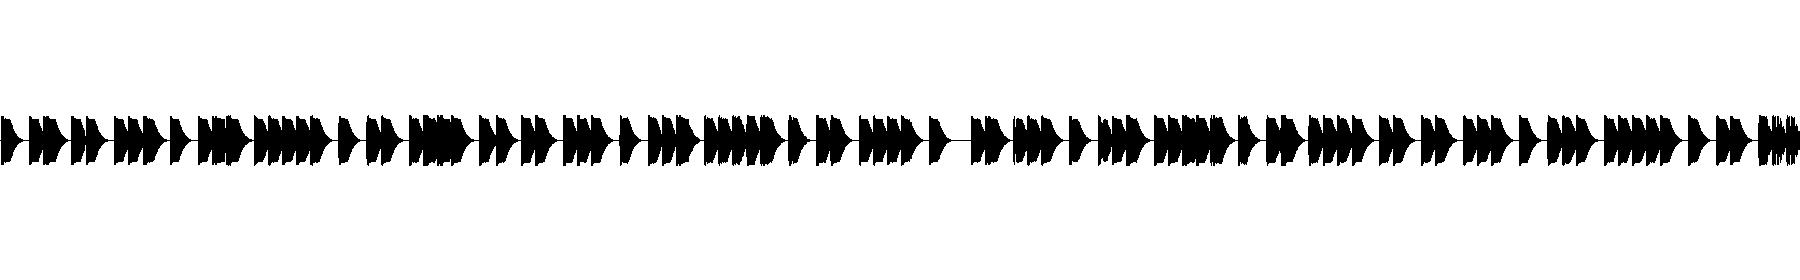 sh 1014